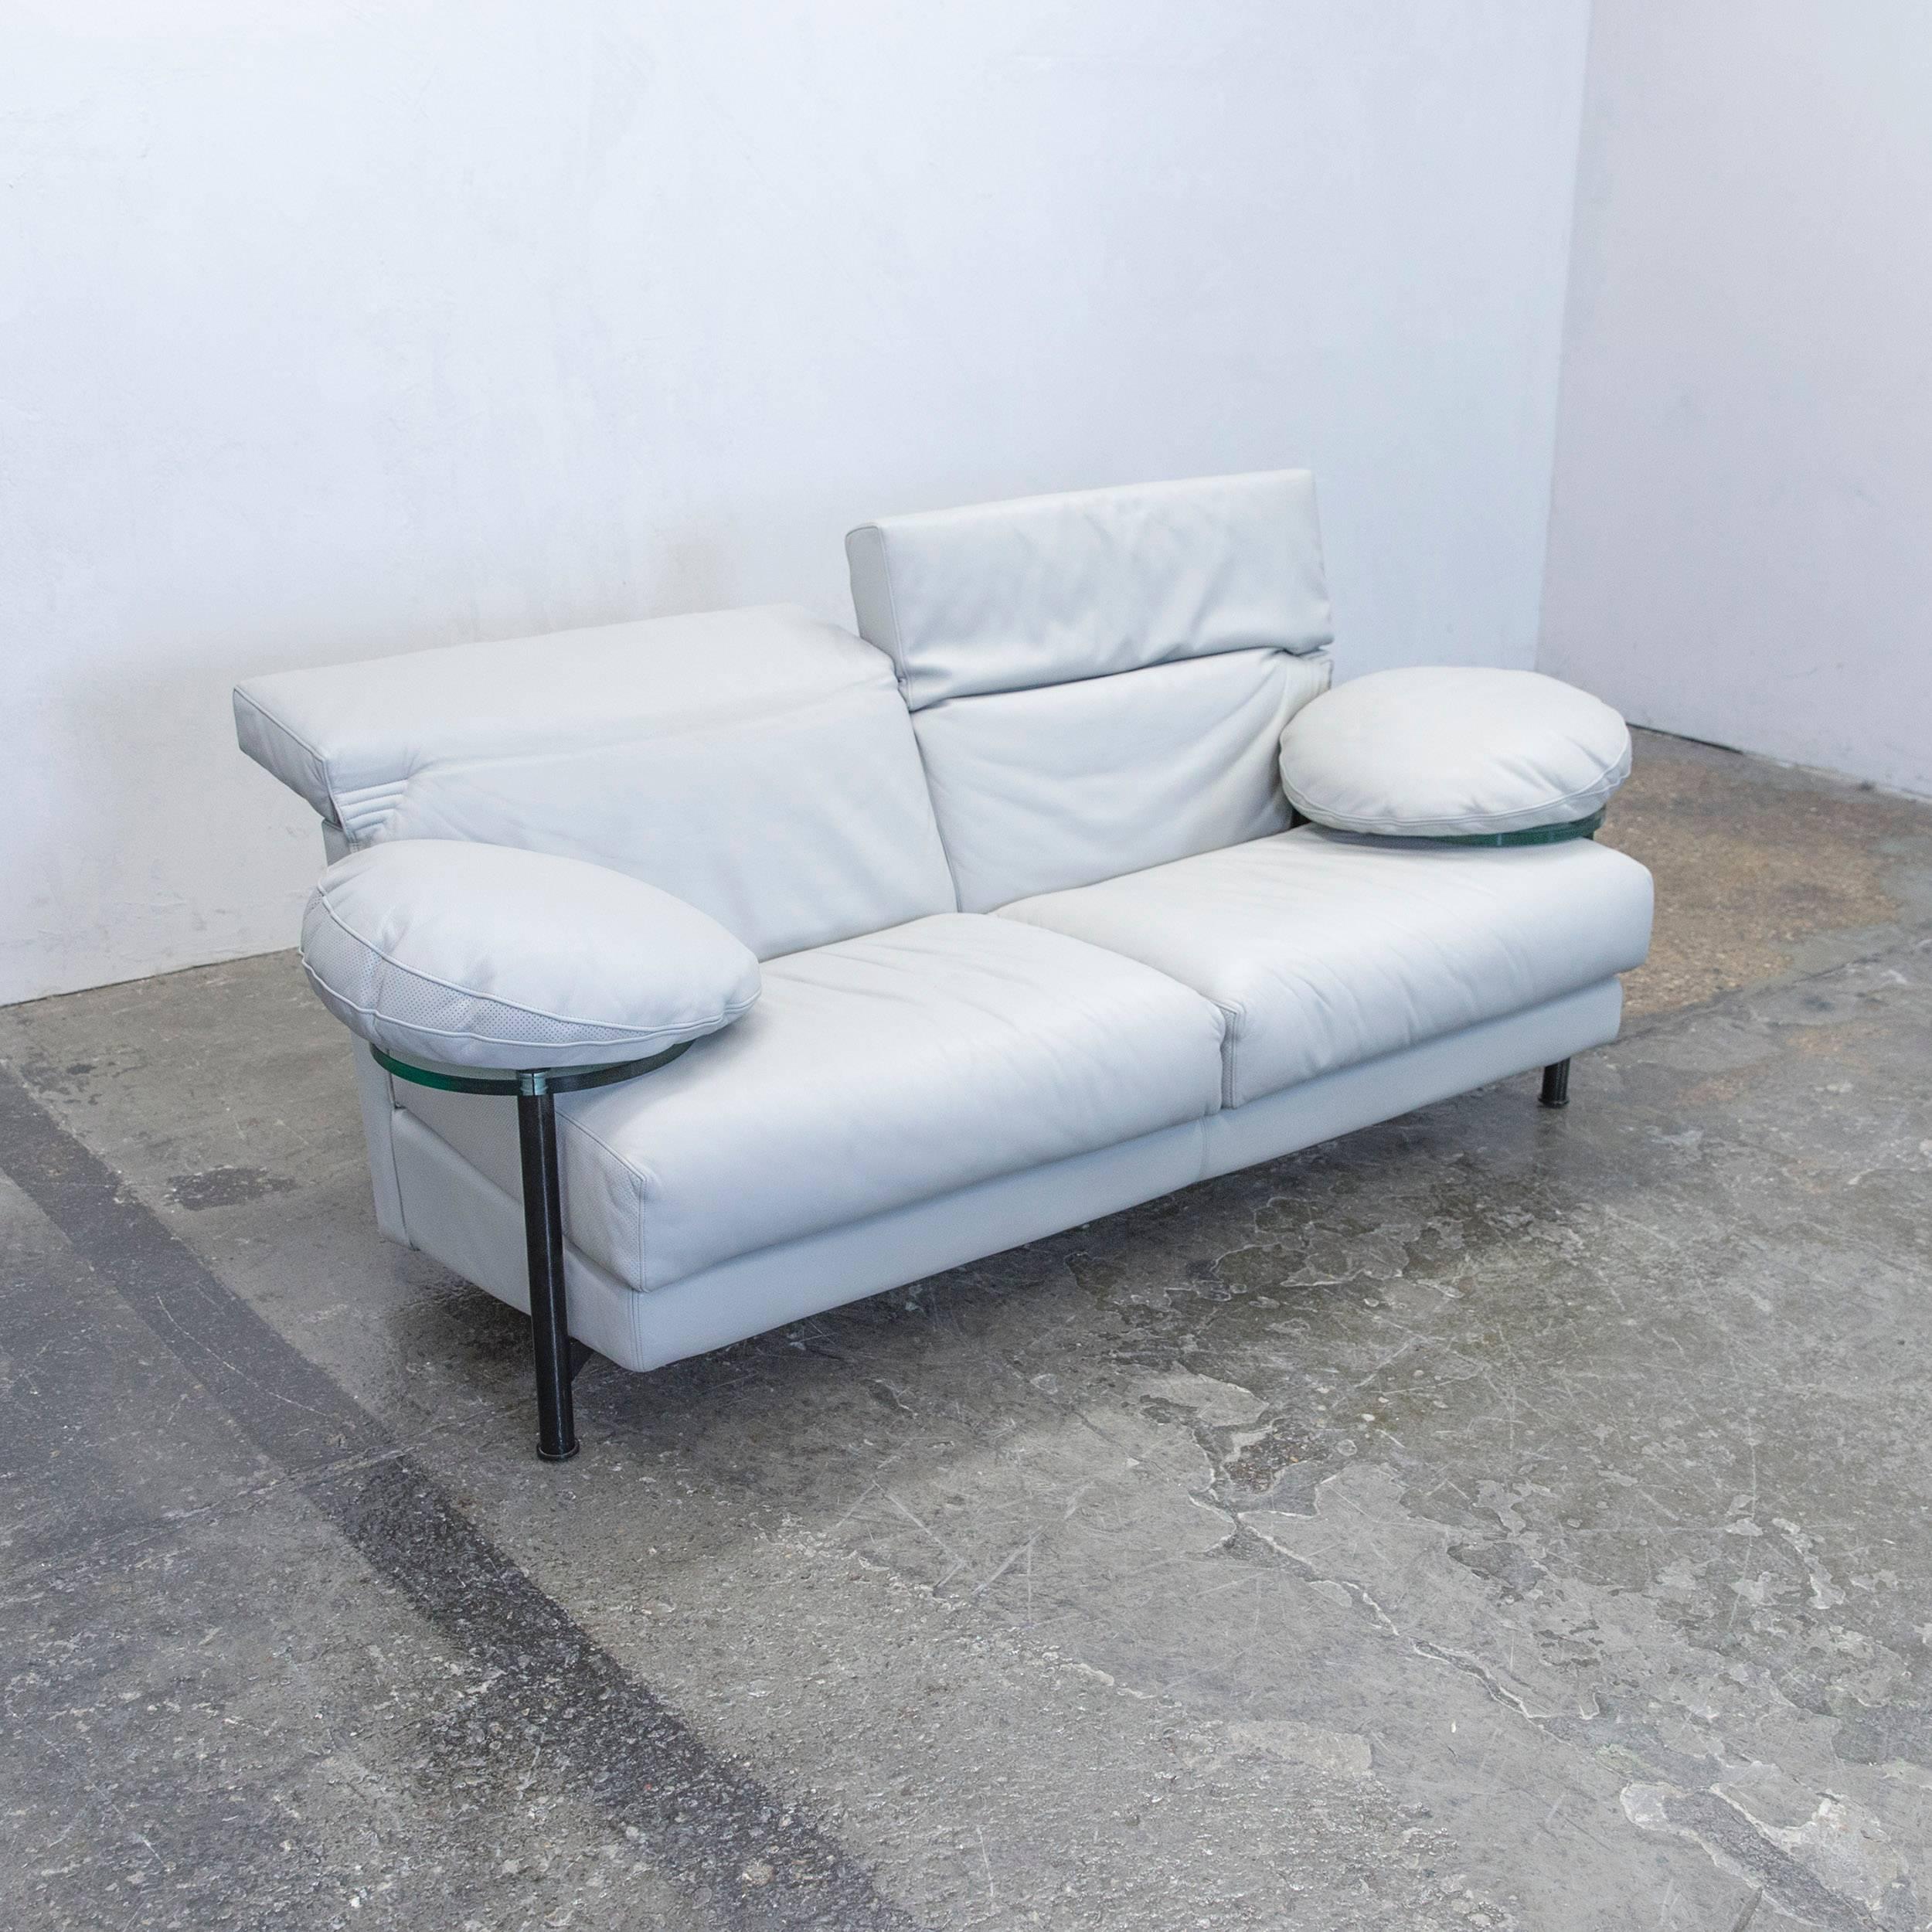 B Italia Arca Paolo Piva Designer Sofa Grey Leather Three Seat Gl Function At 1stdibs